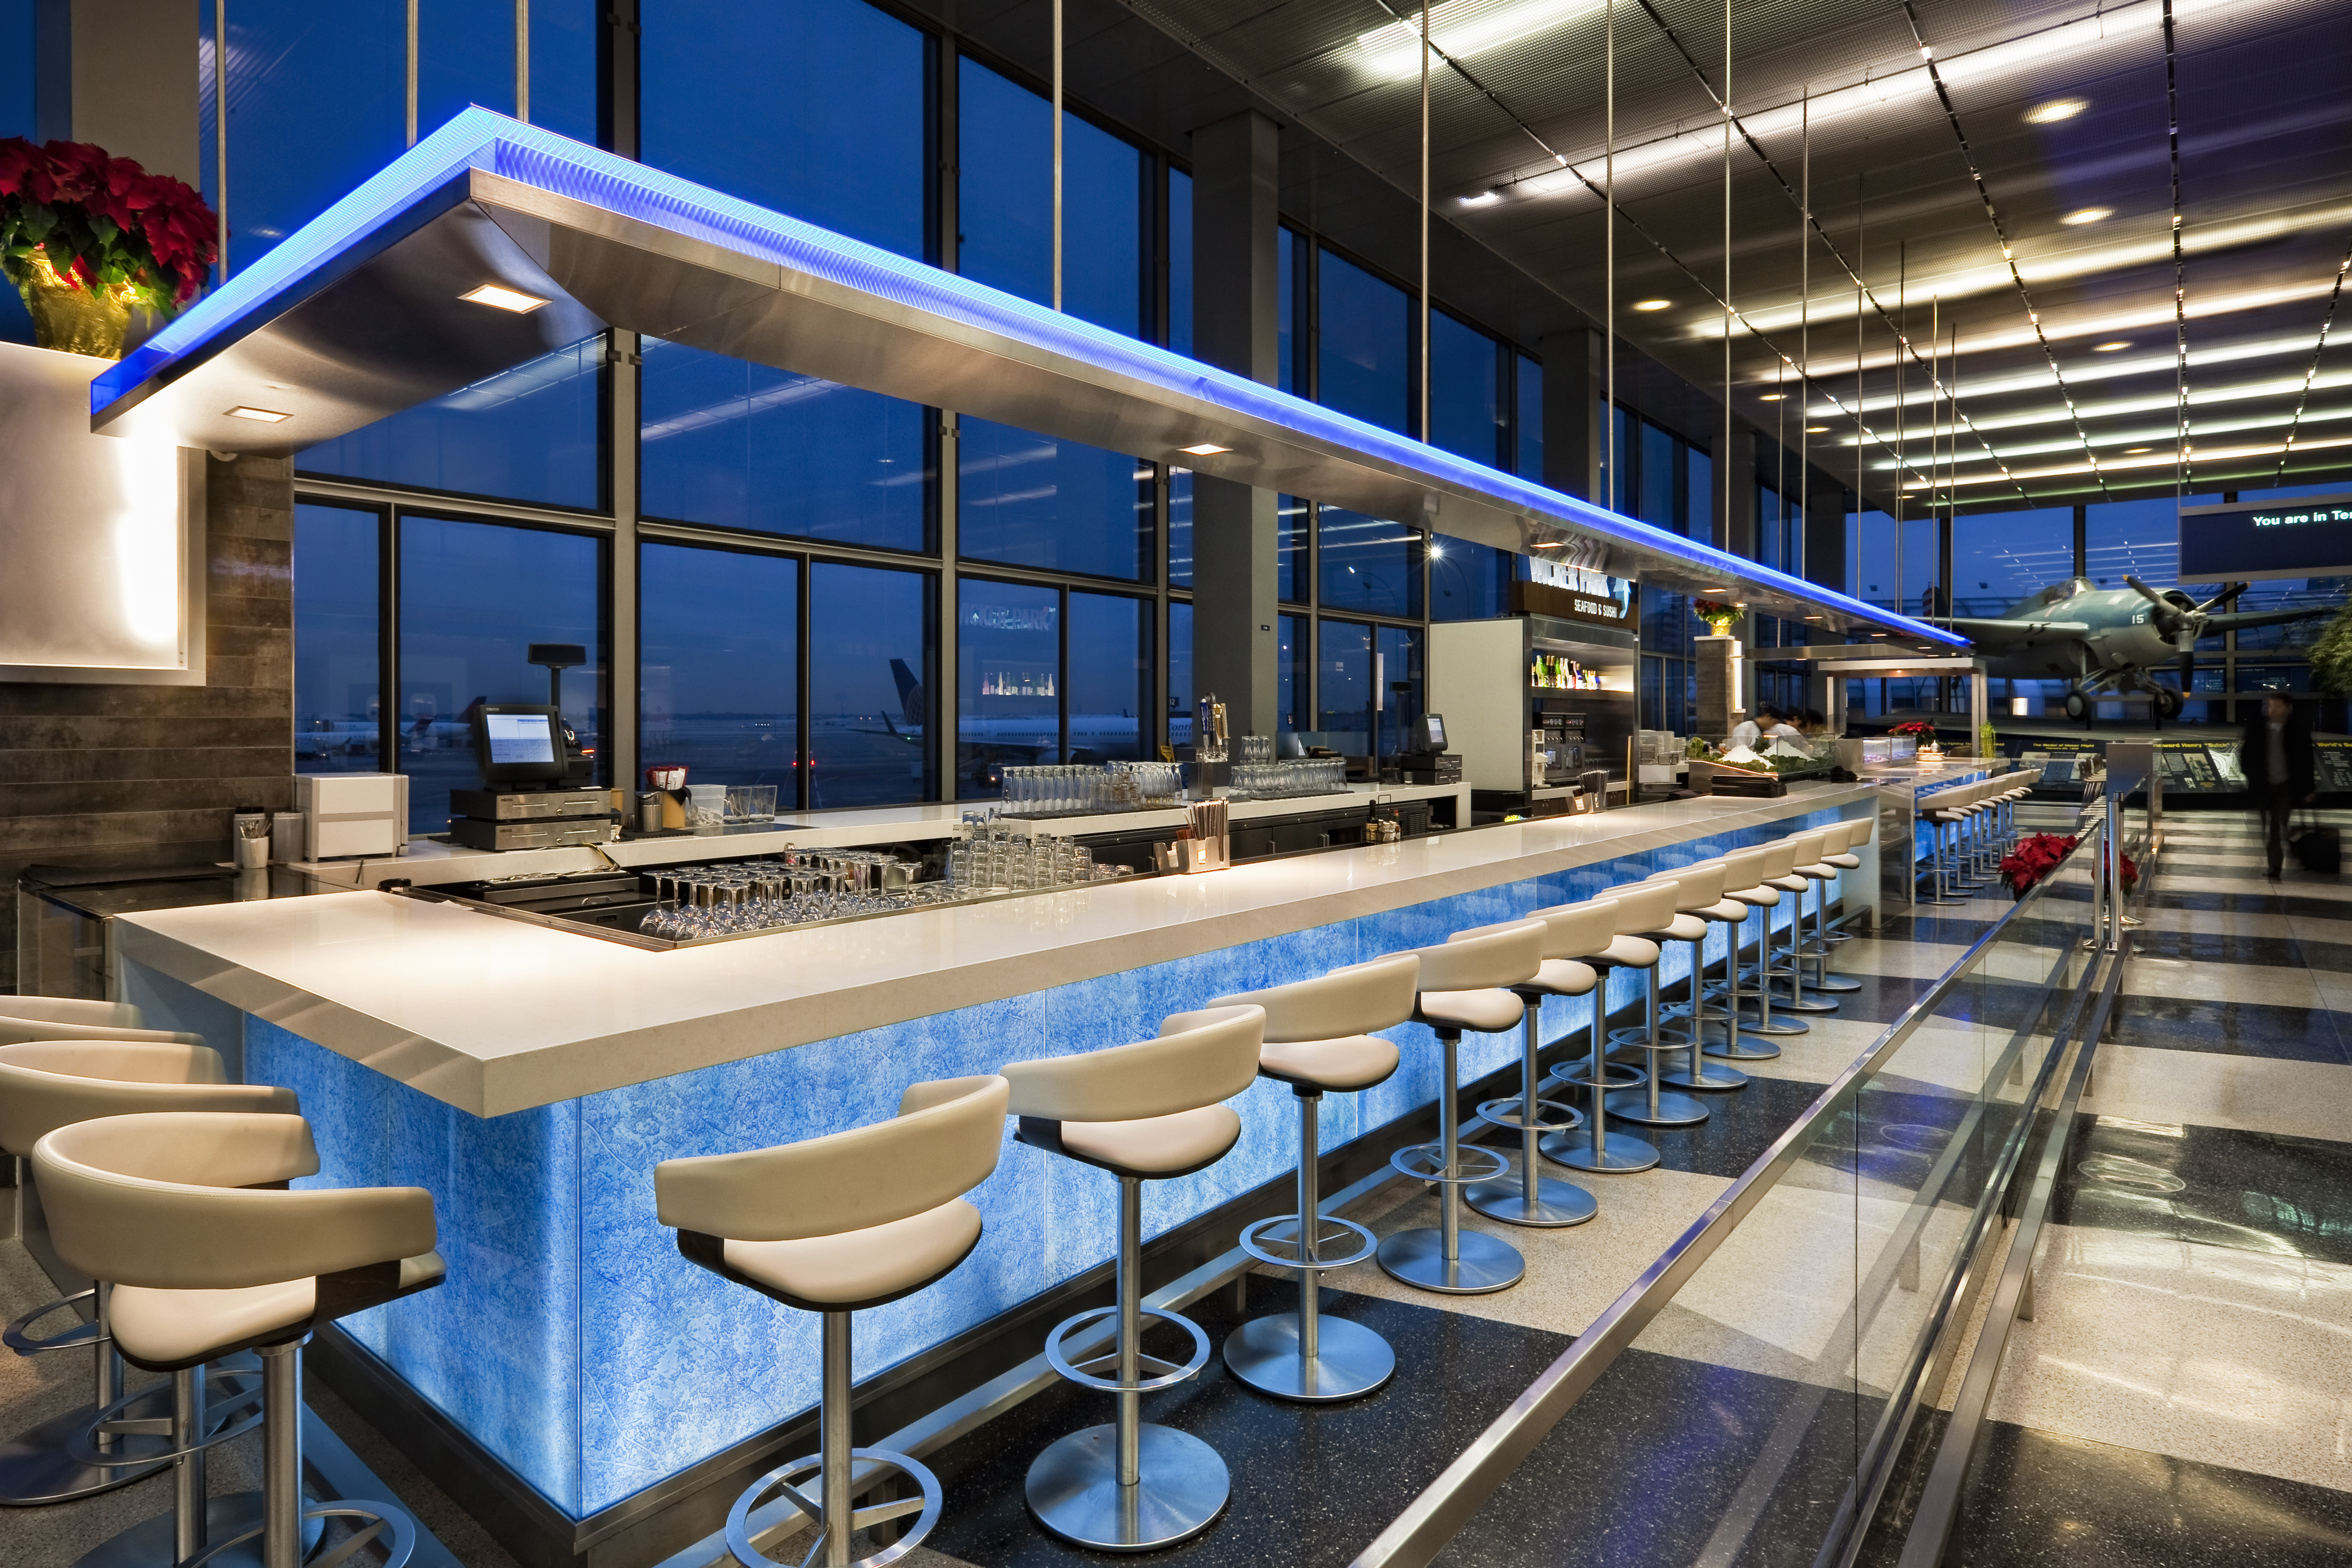 Lincoln Park Airport Restaurant Menu